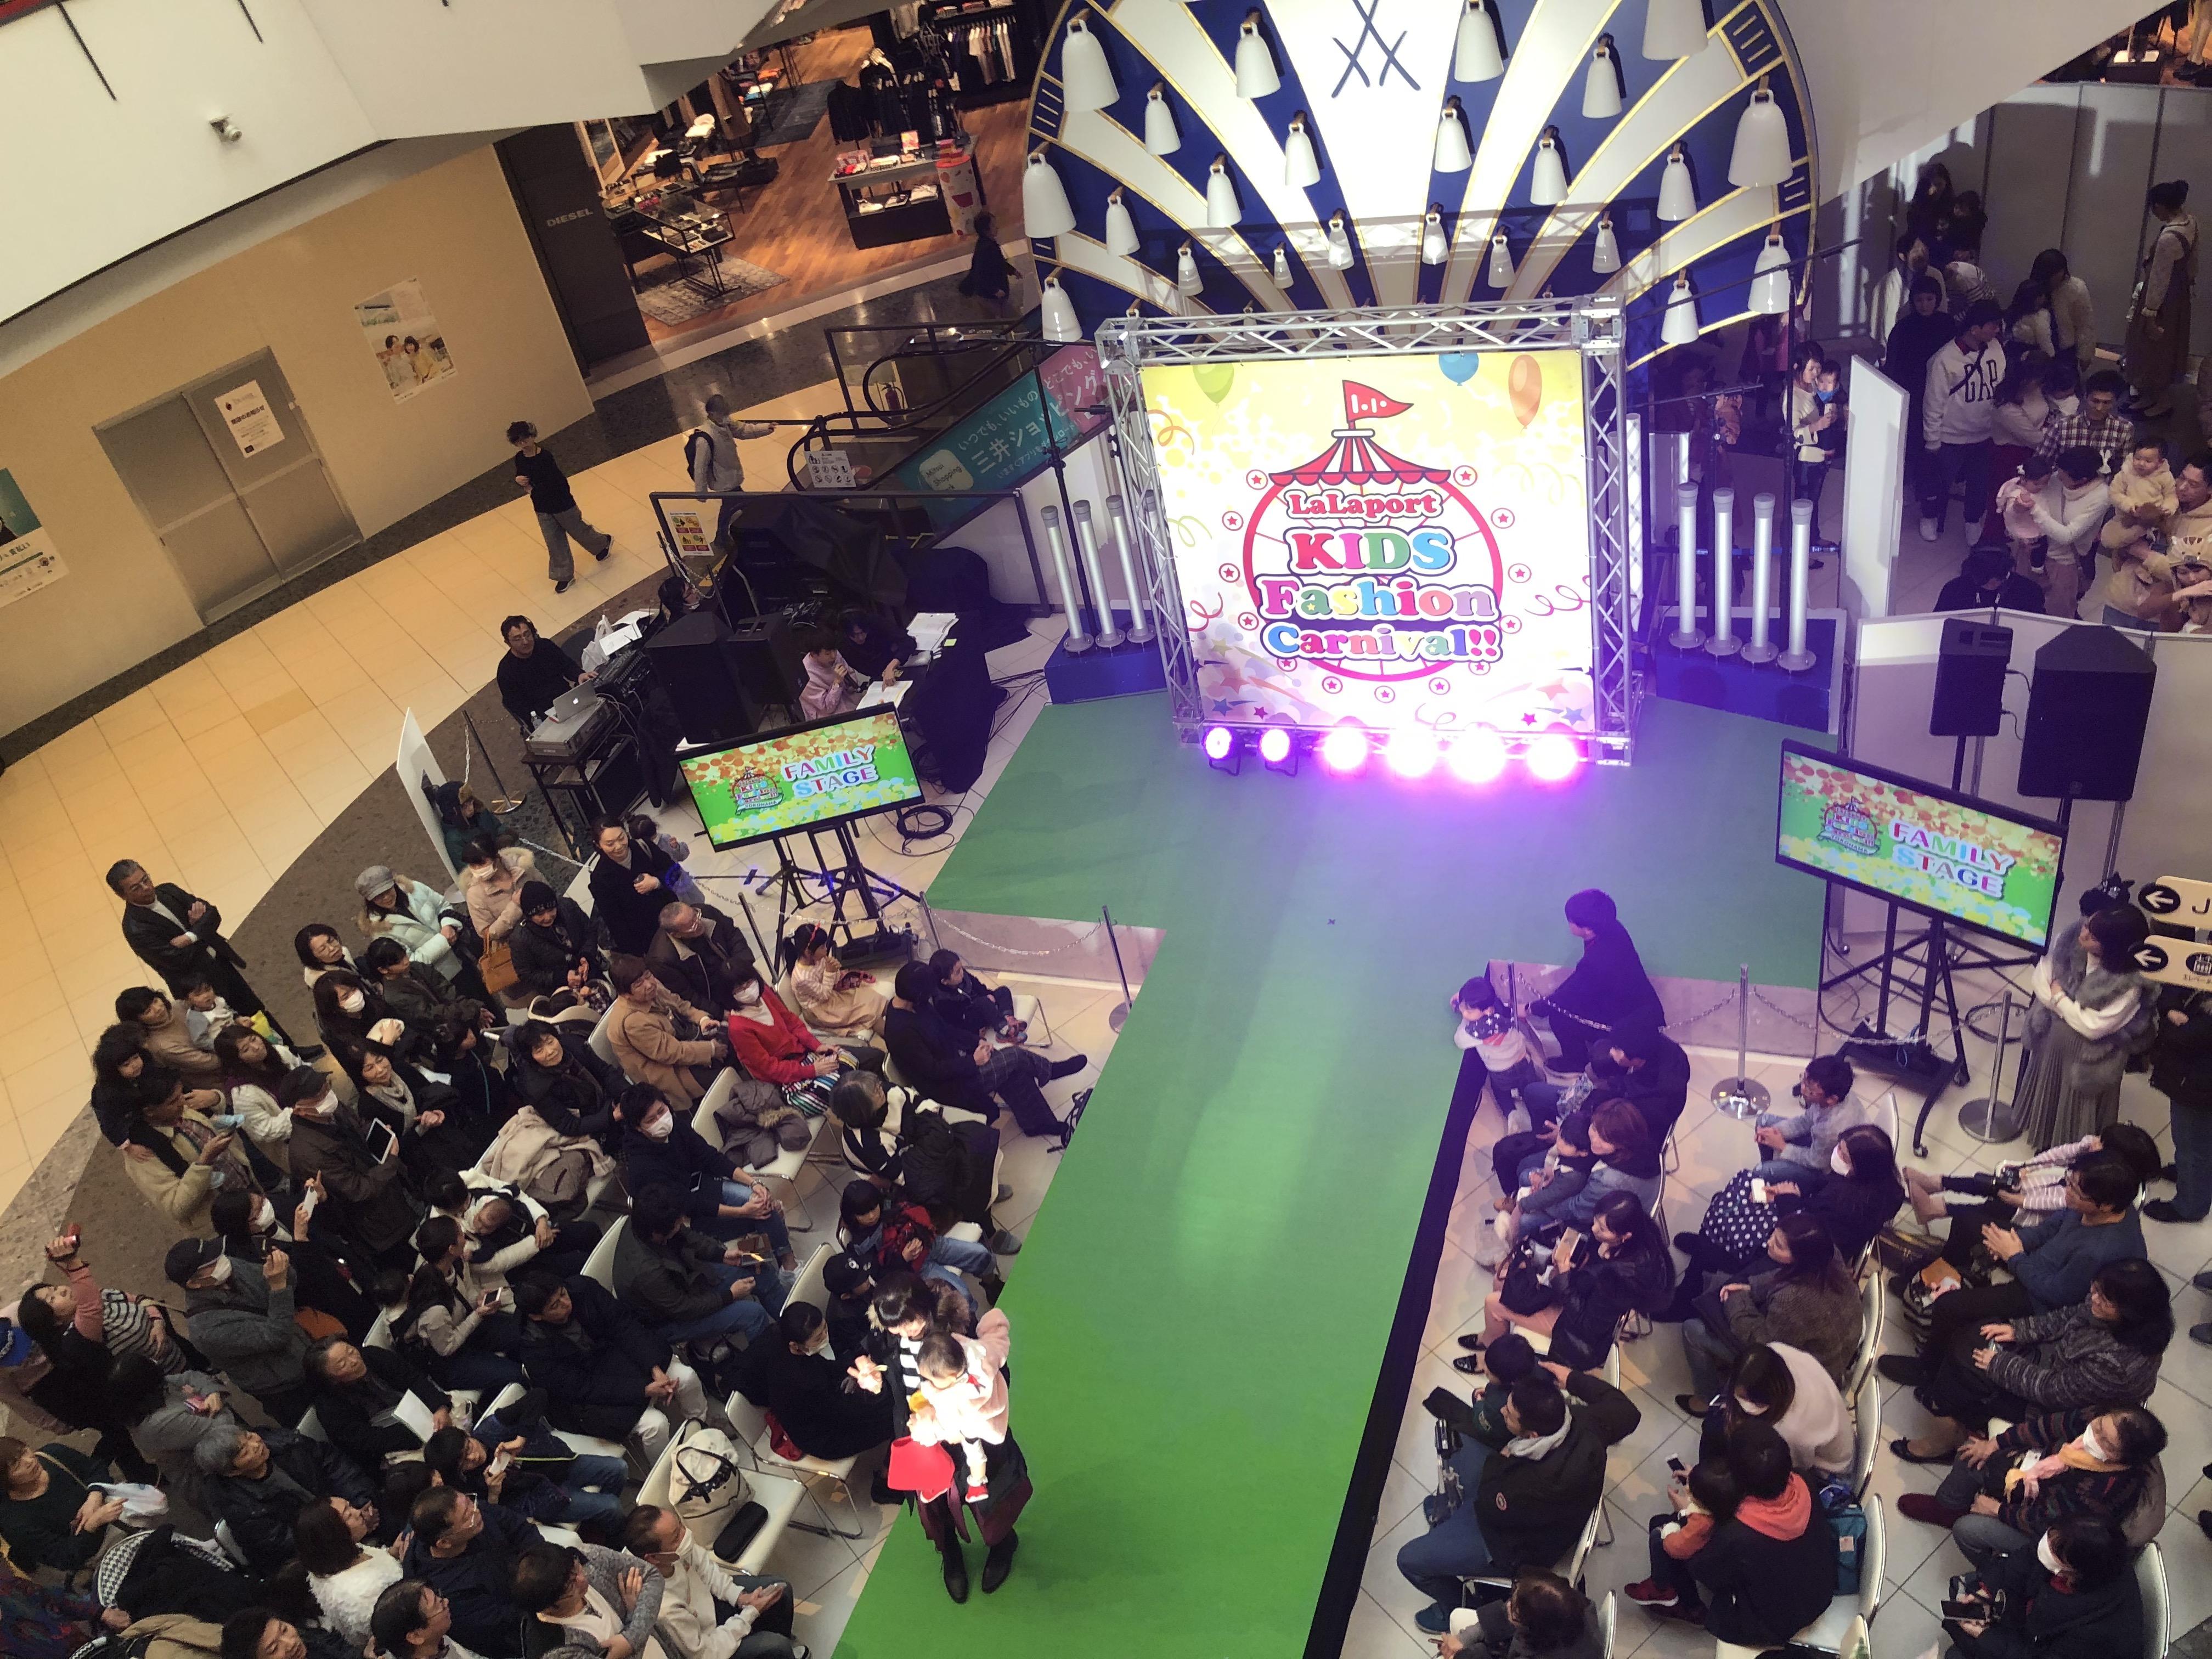 LaLaport KIDS Fashion Carnival!!